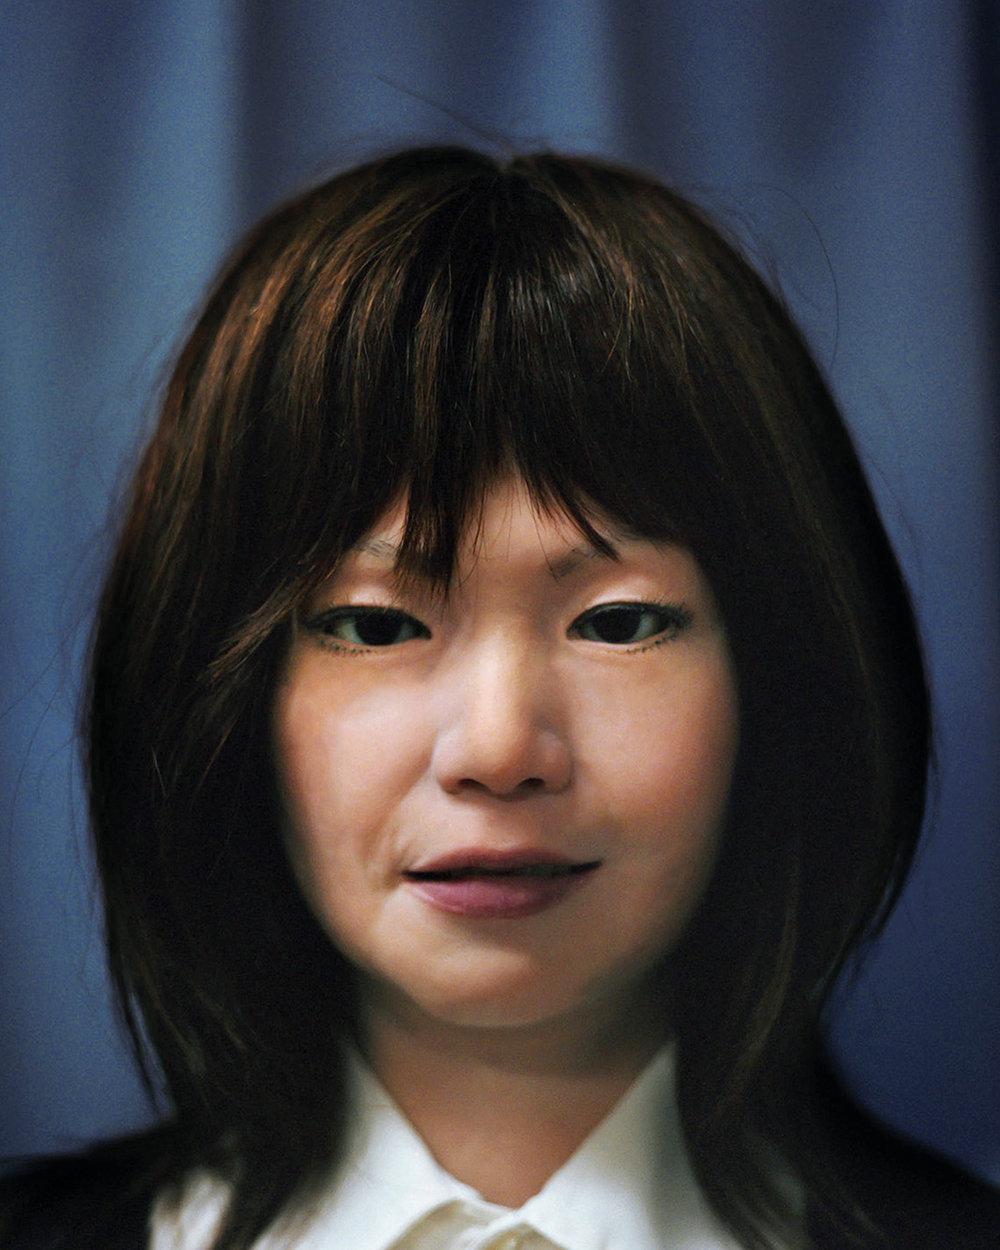 Portrait of Actroid-F,  2013  Hiroshi Ishiguro Laboratories, ATR